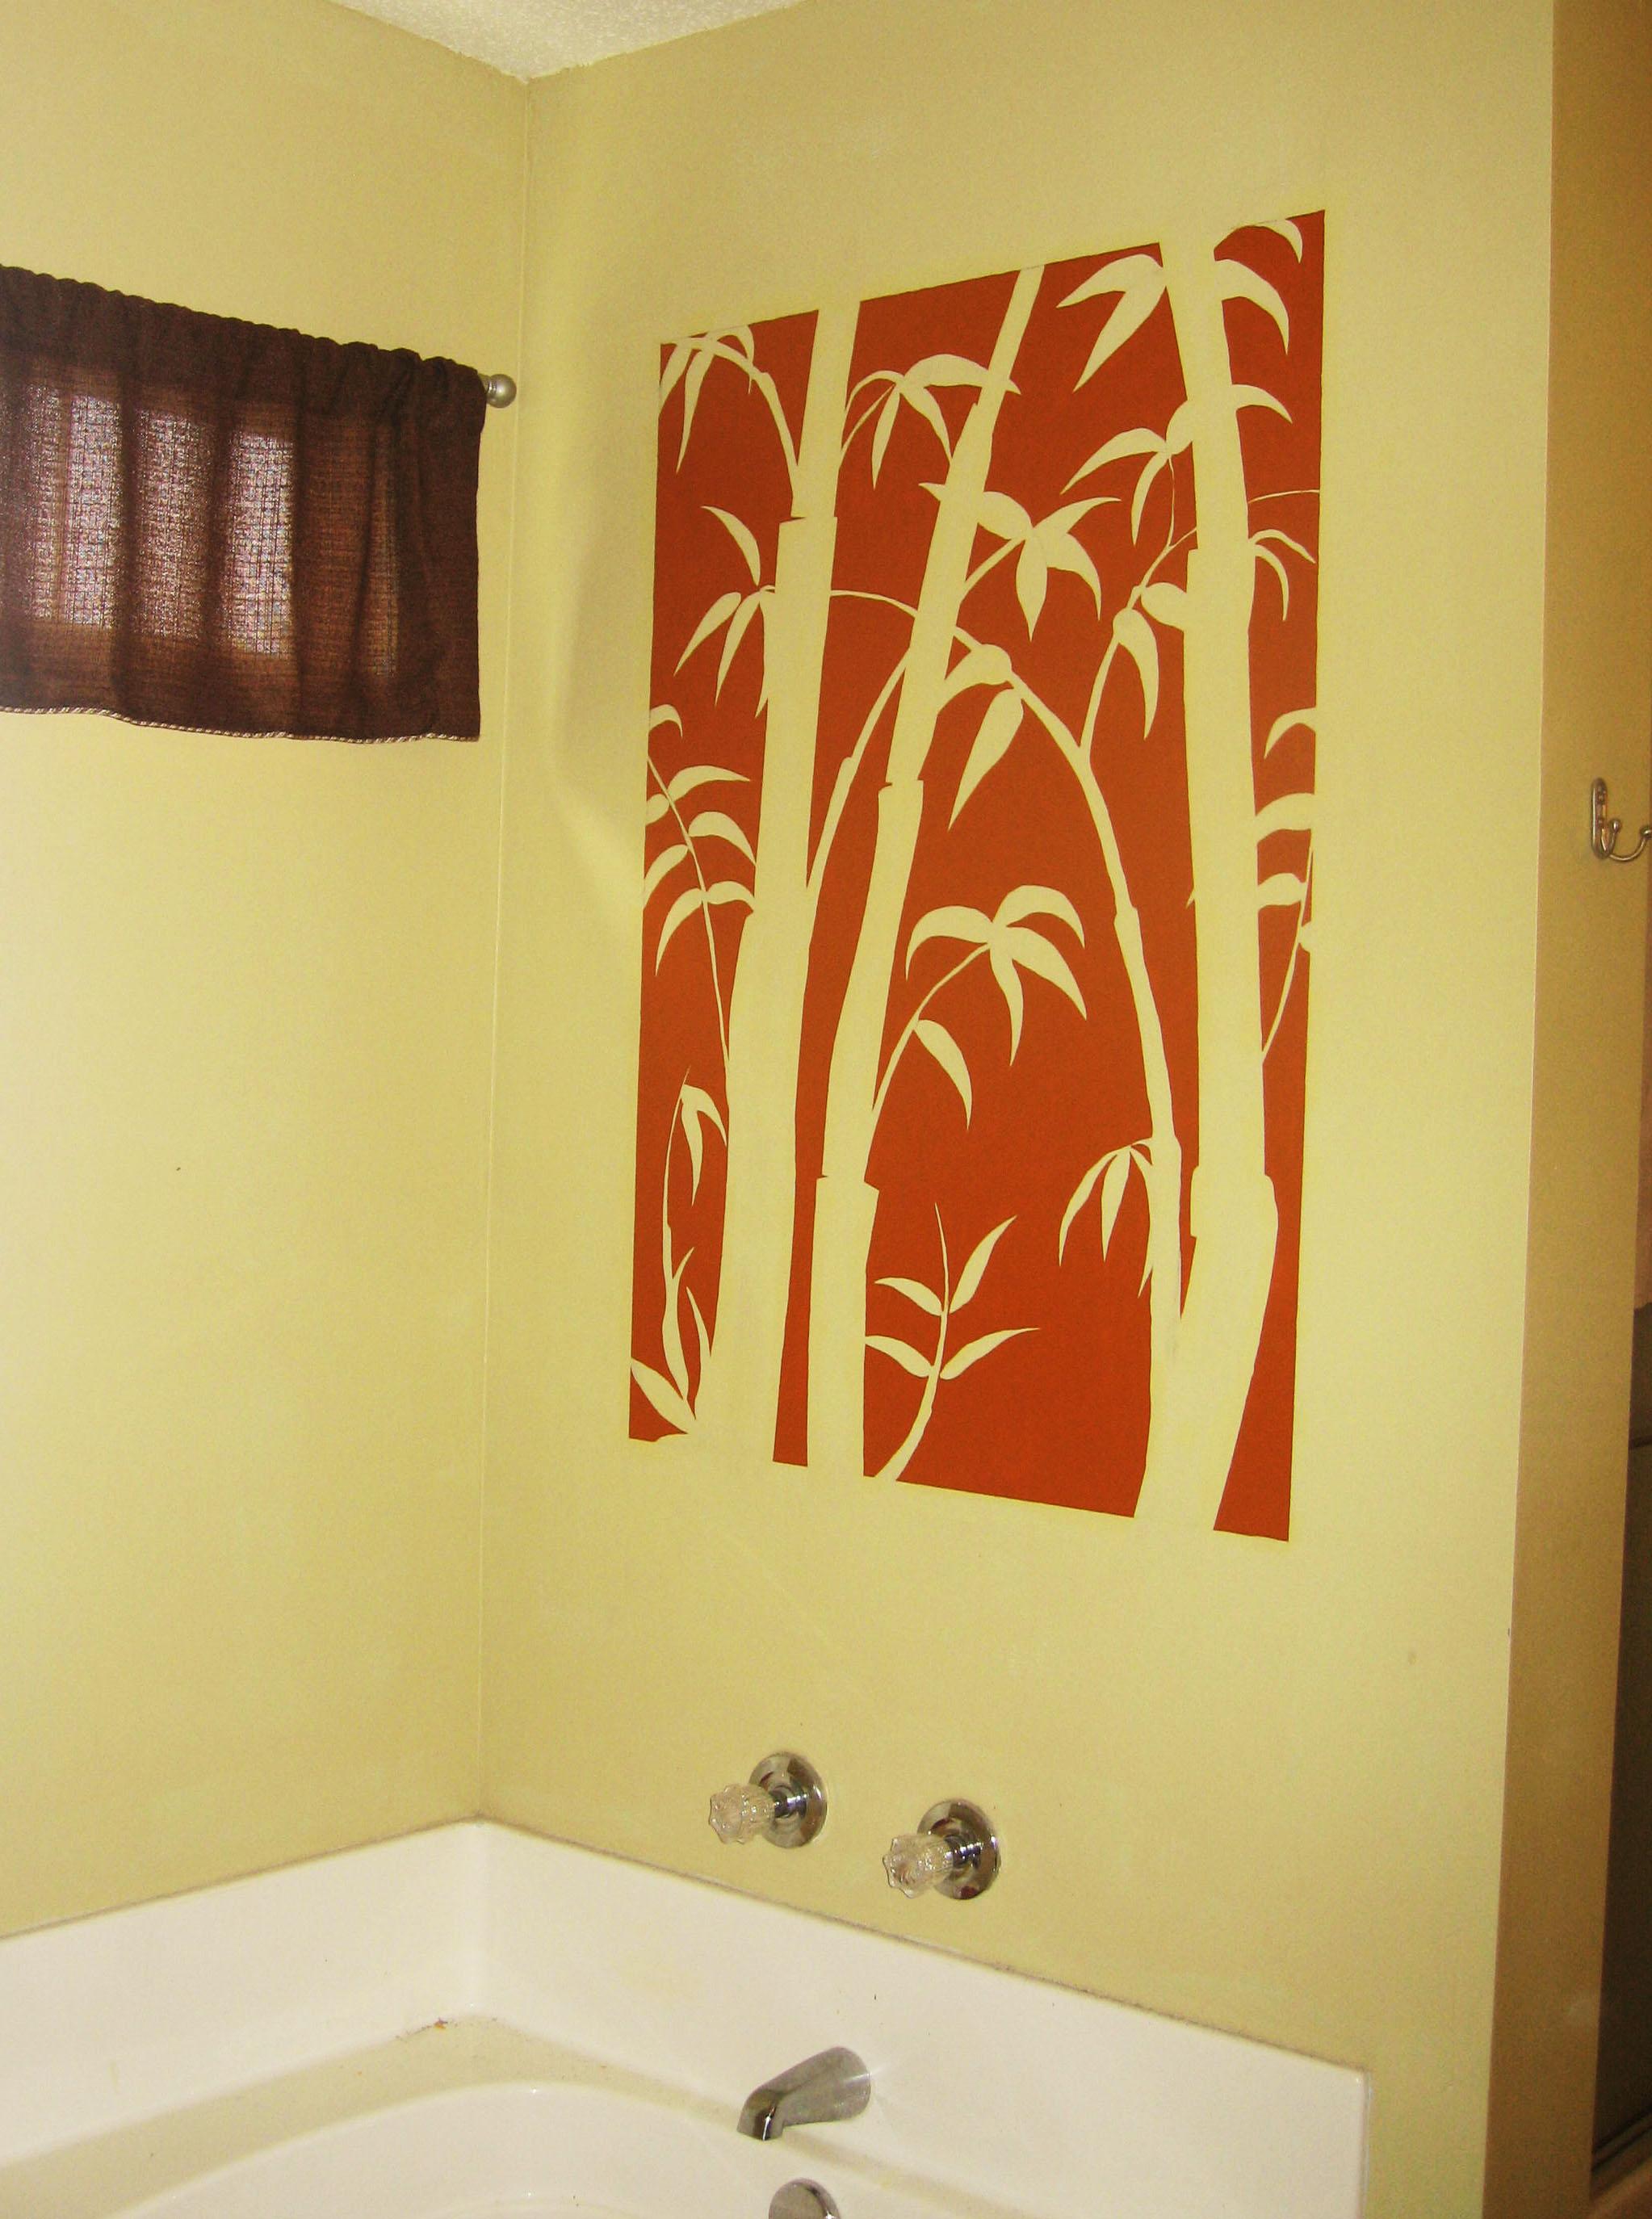 Uae murals bamboo silhouette mural for Mural u vukovarskoj ulici